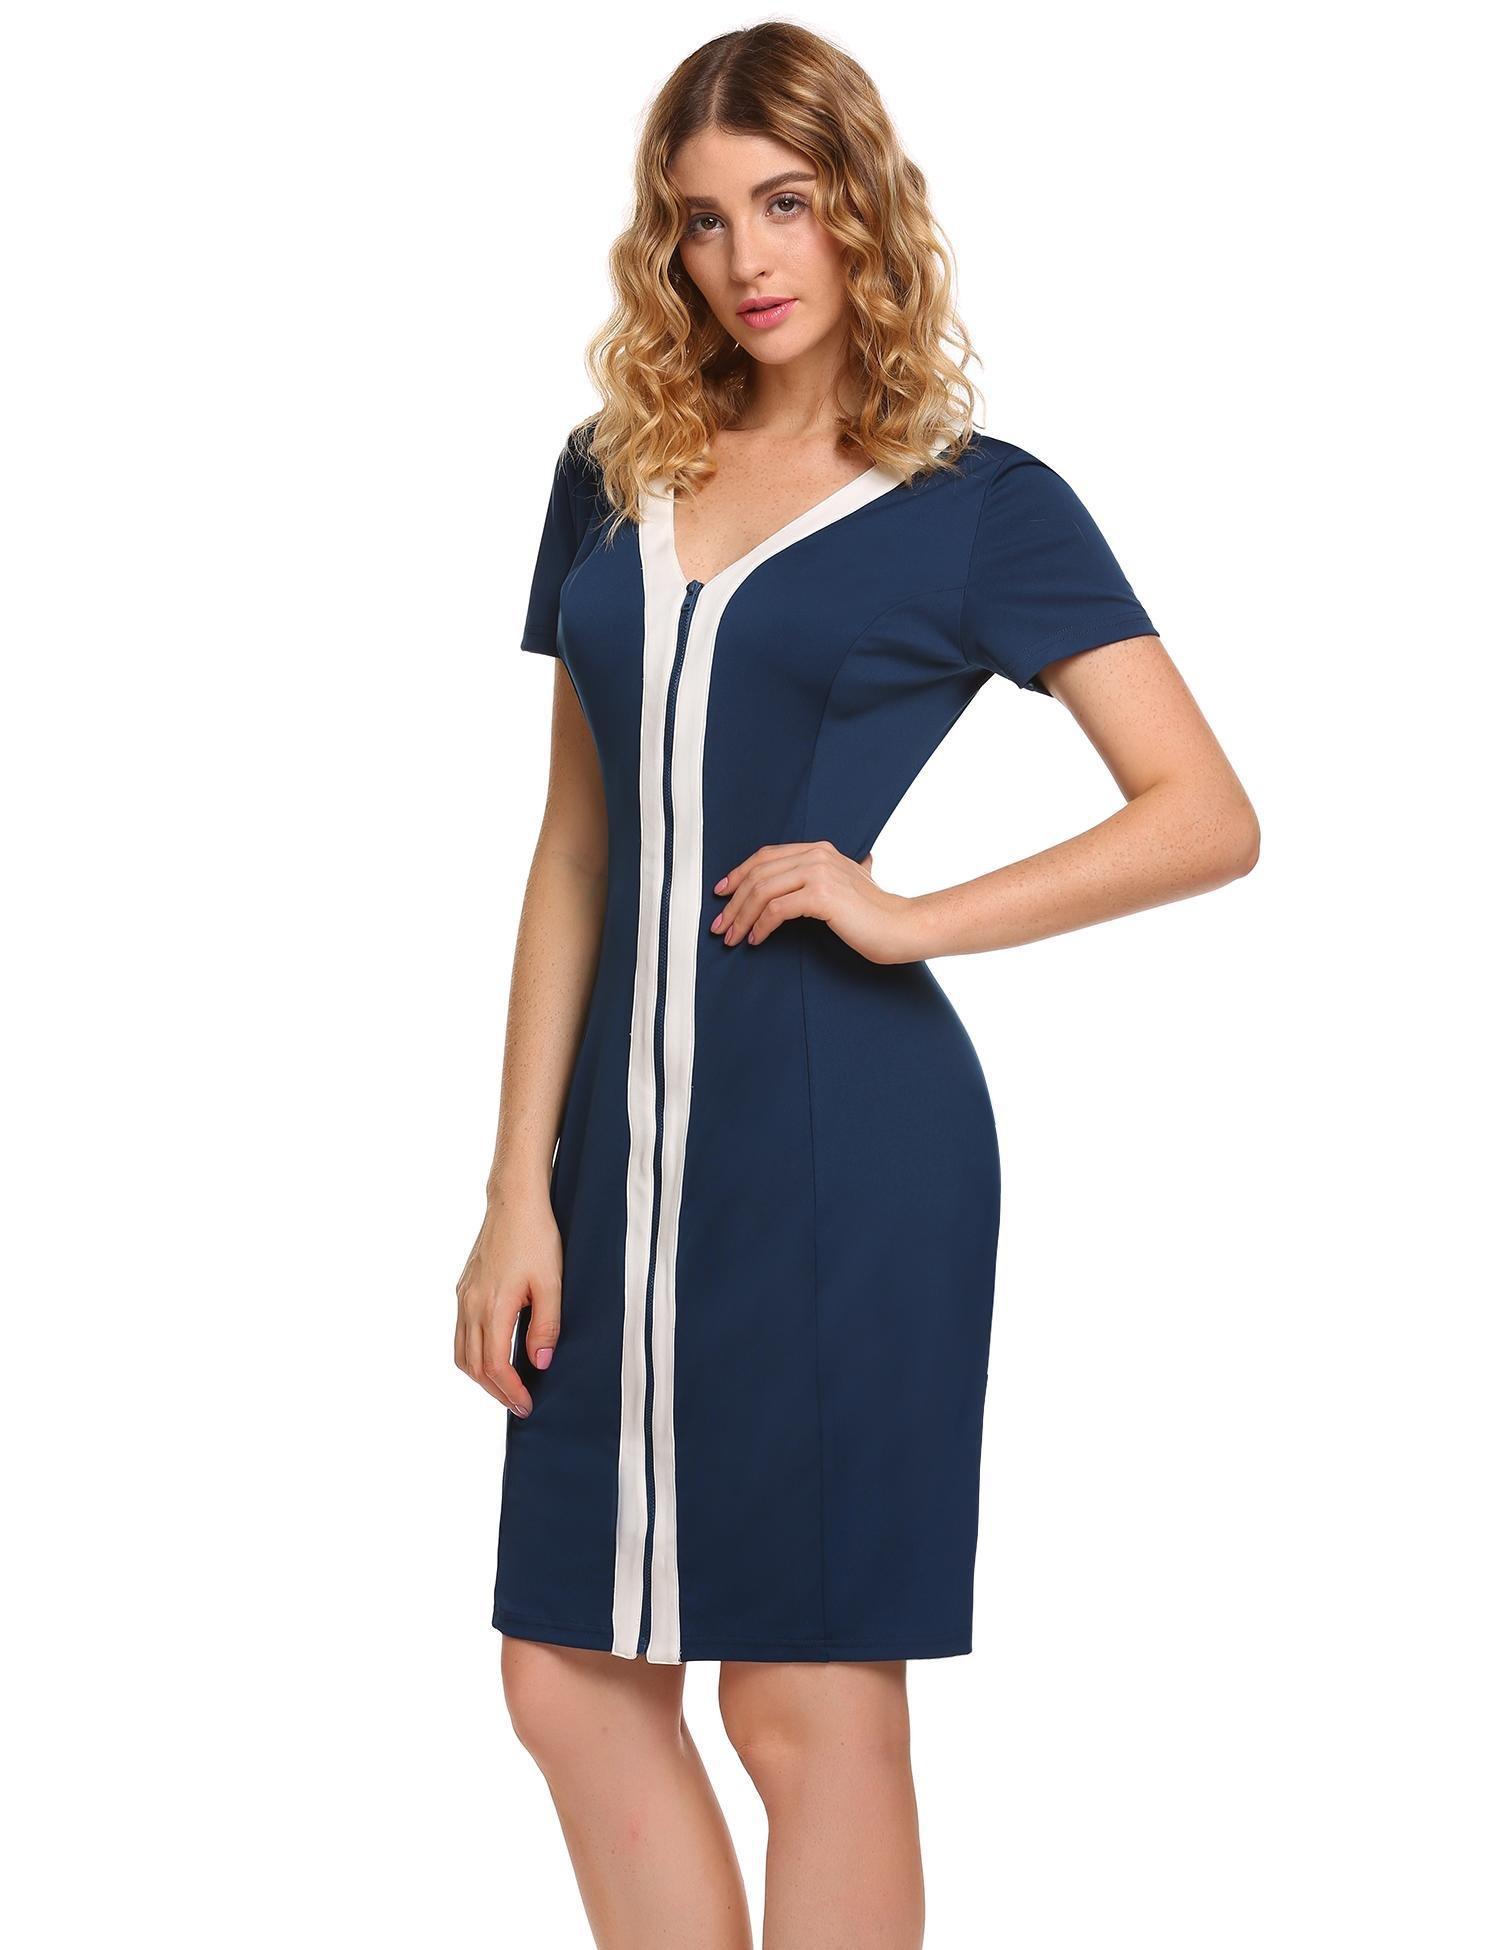 ANGVNS Women V Neck Zipper Front Contrast Color Casual Bodycon Pencil Dress